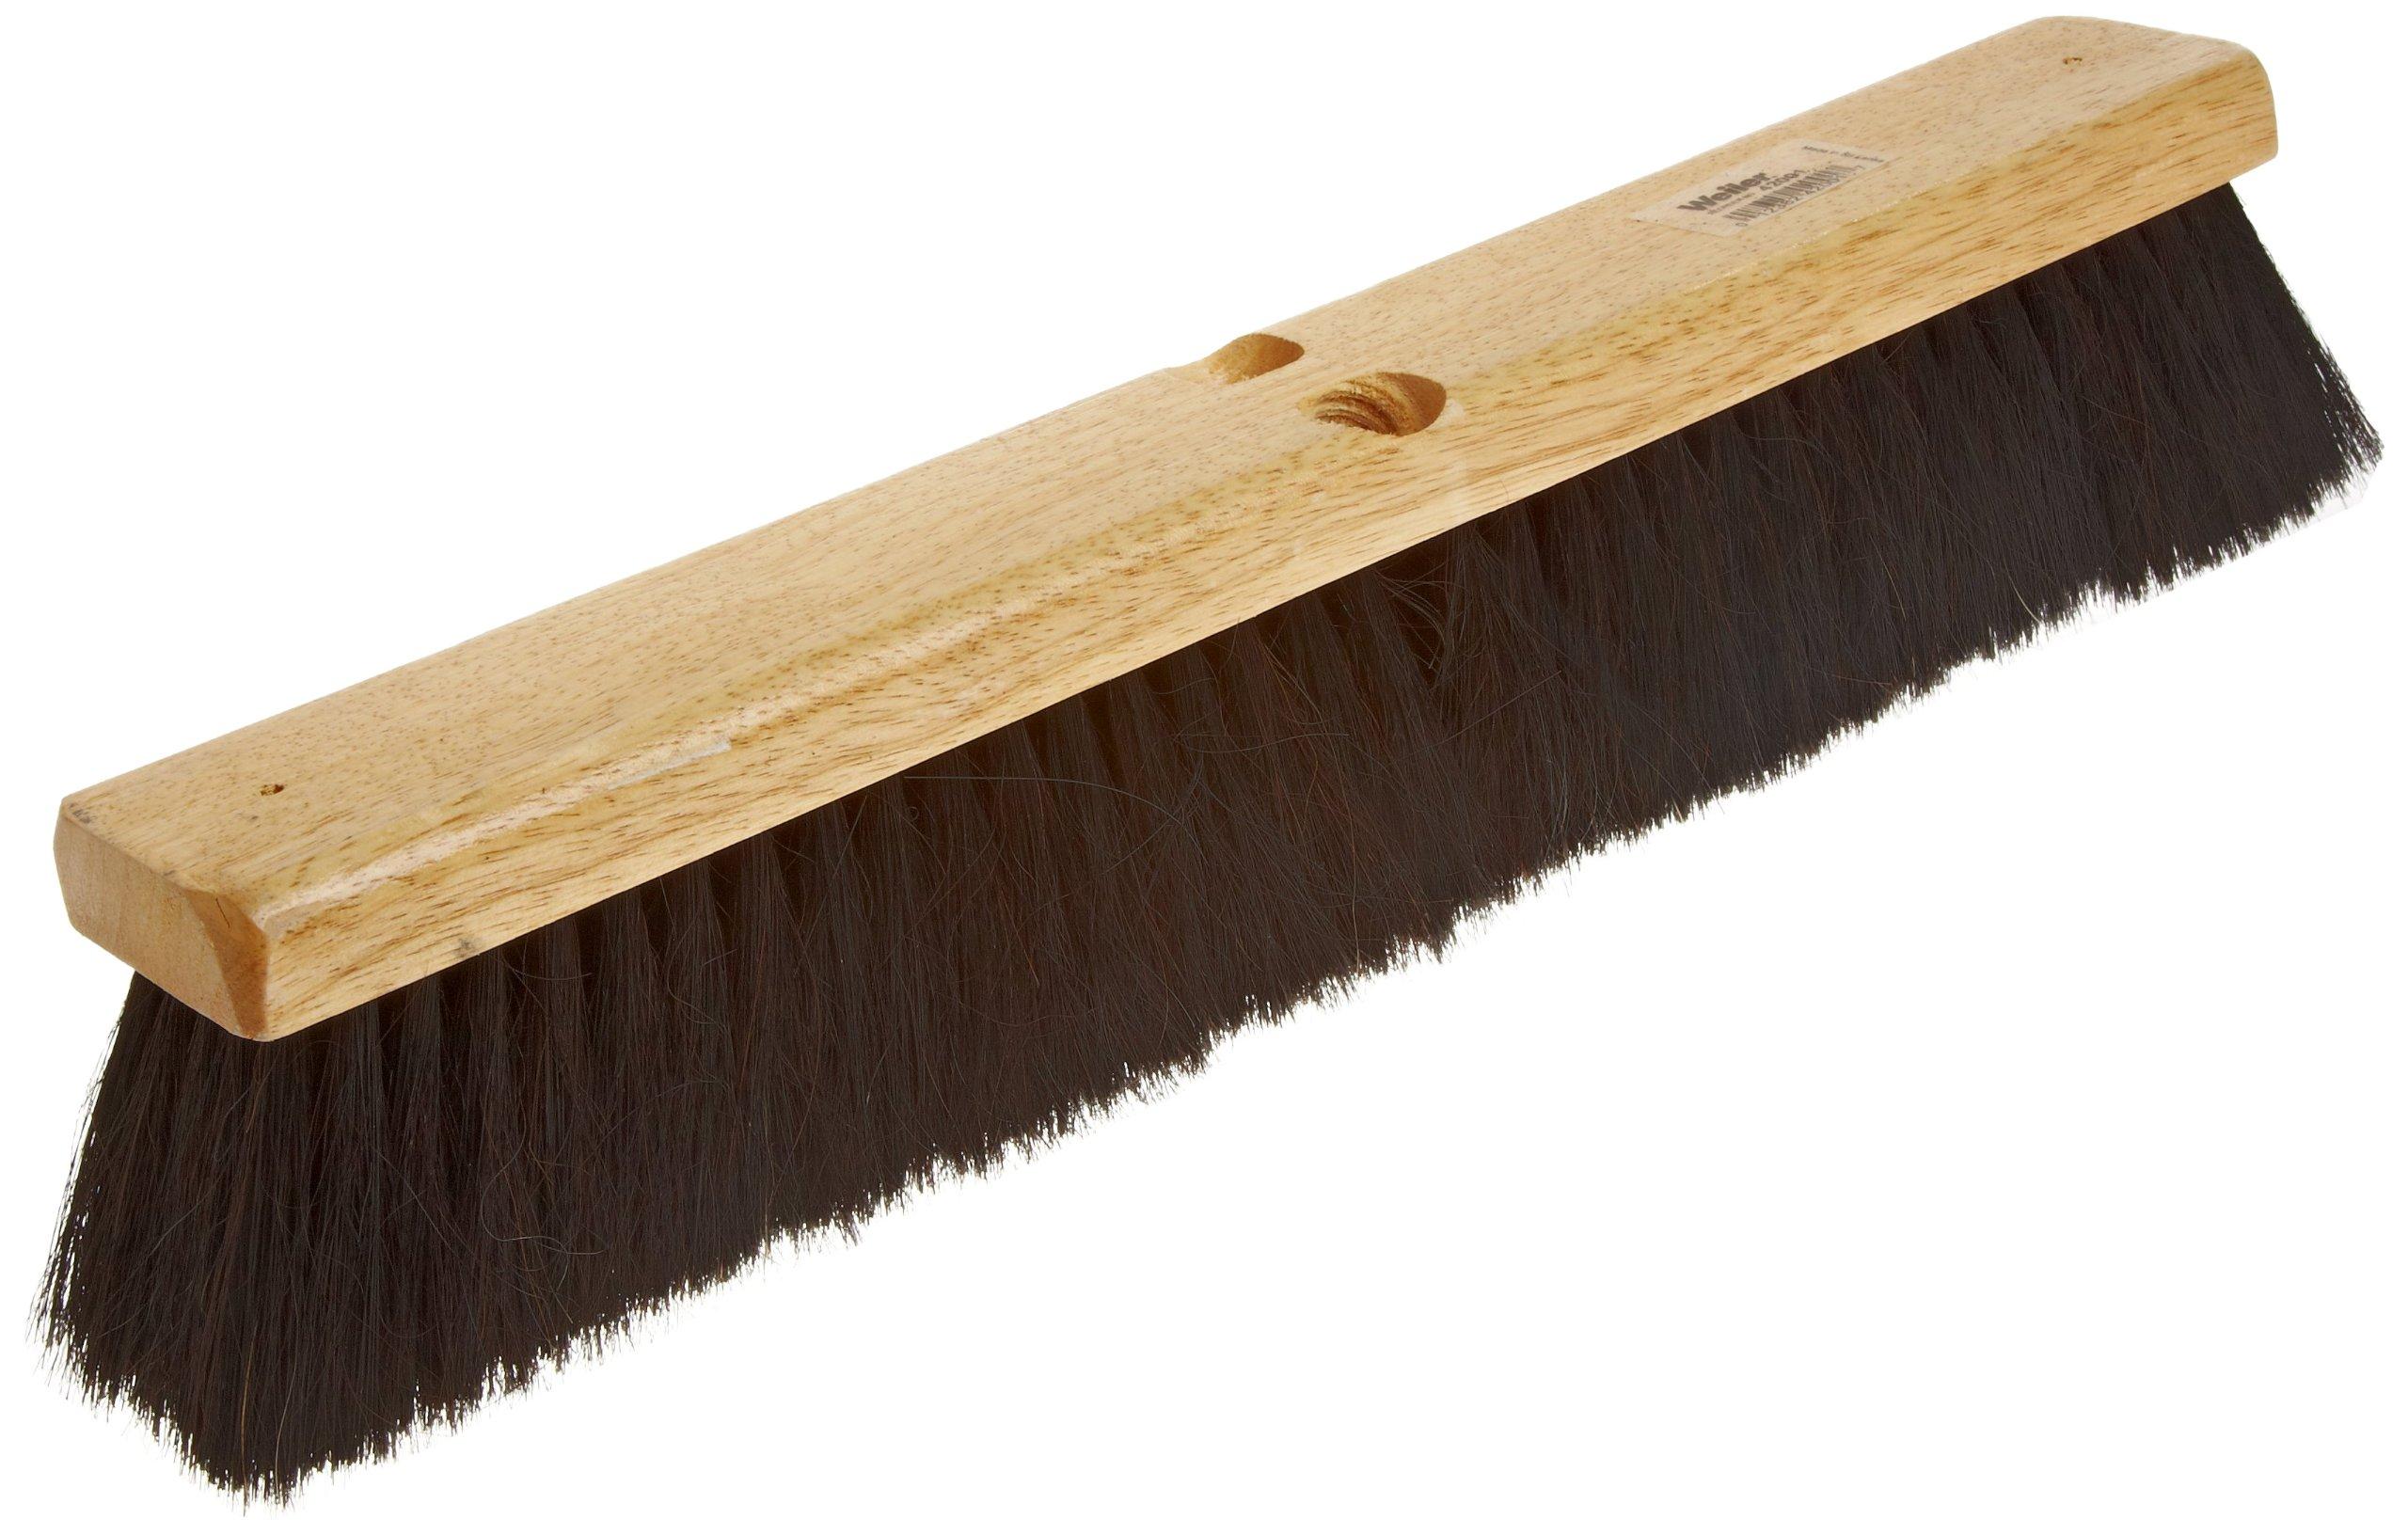 Weiler 42002 Horsehair Fine Sweep Floor Brush, 2-1/2'' Head Width, 24'' Overall Length, Natural by Weiler